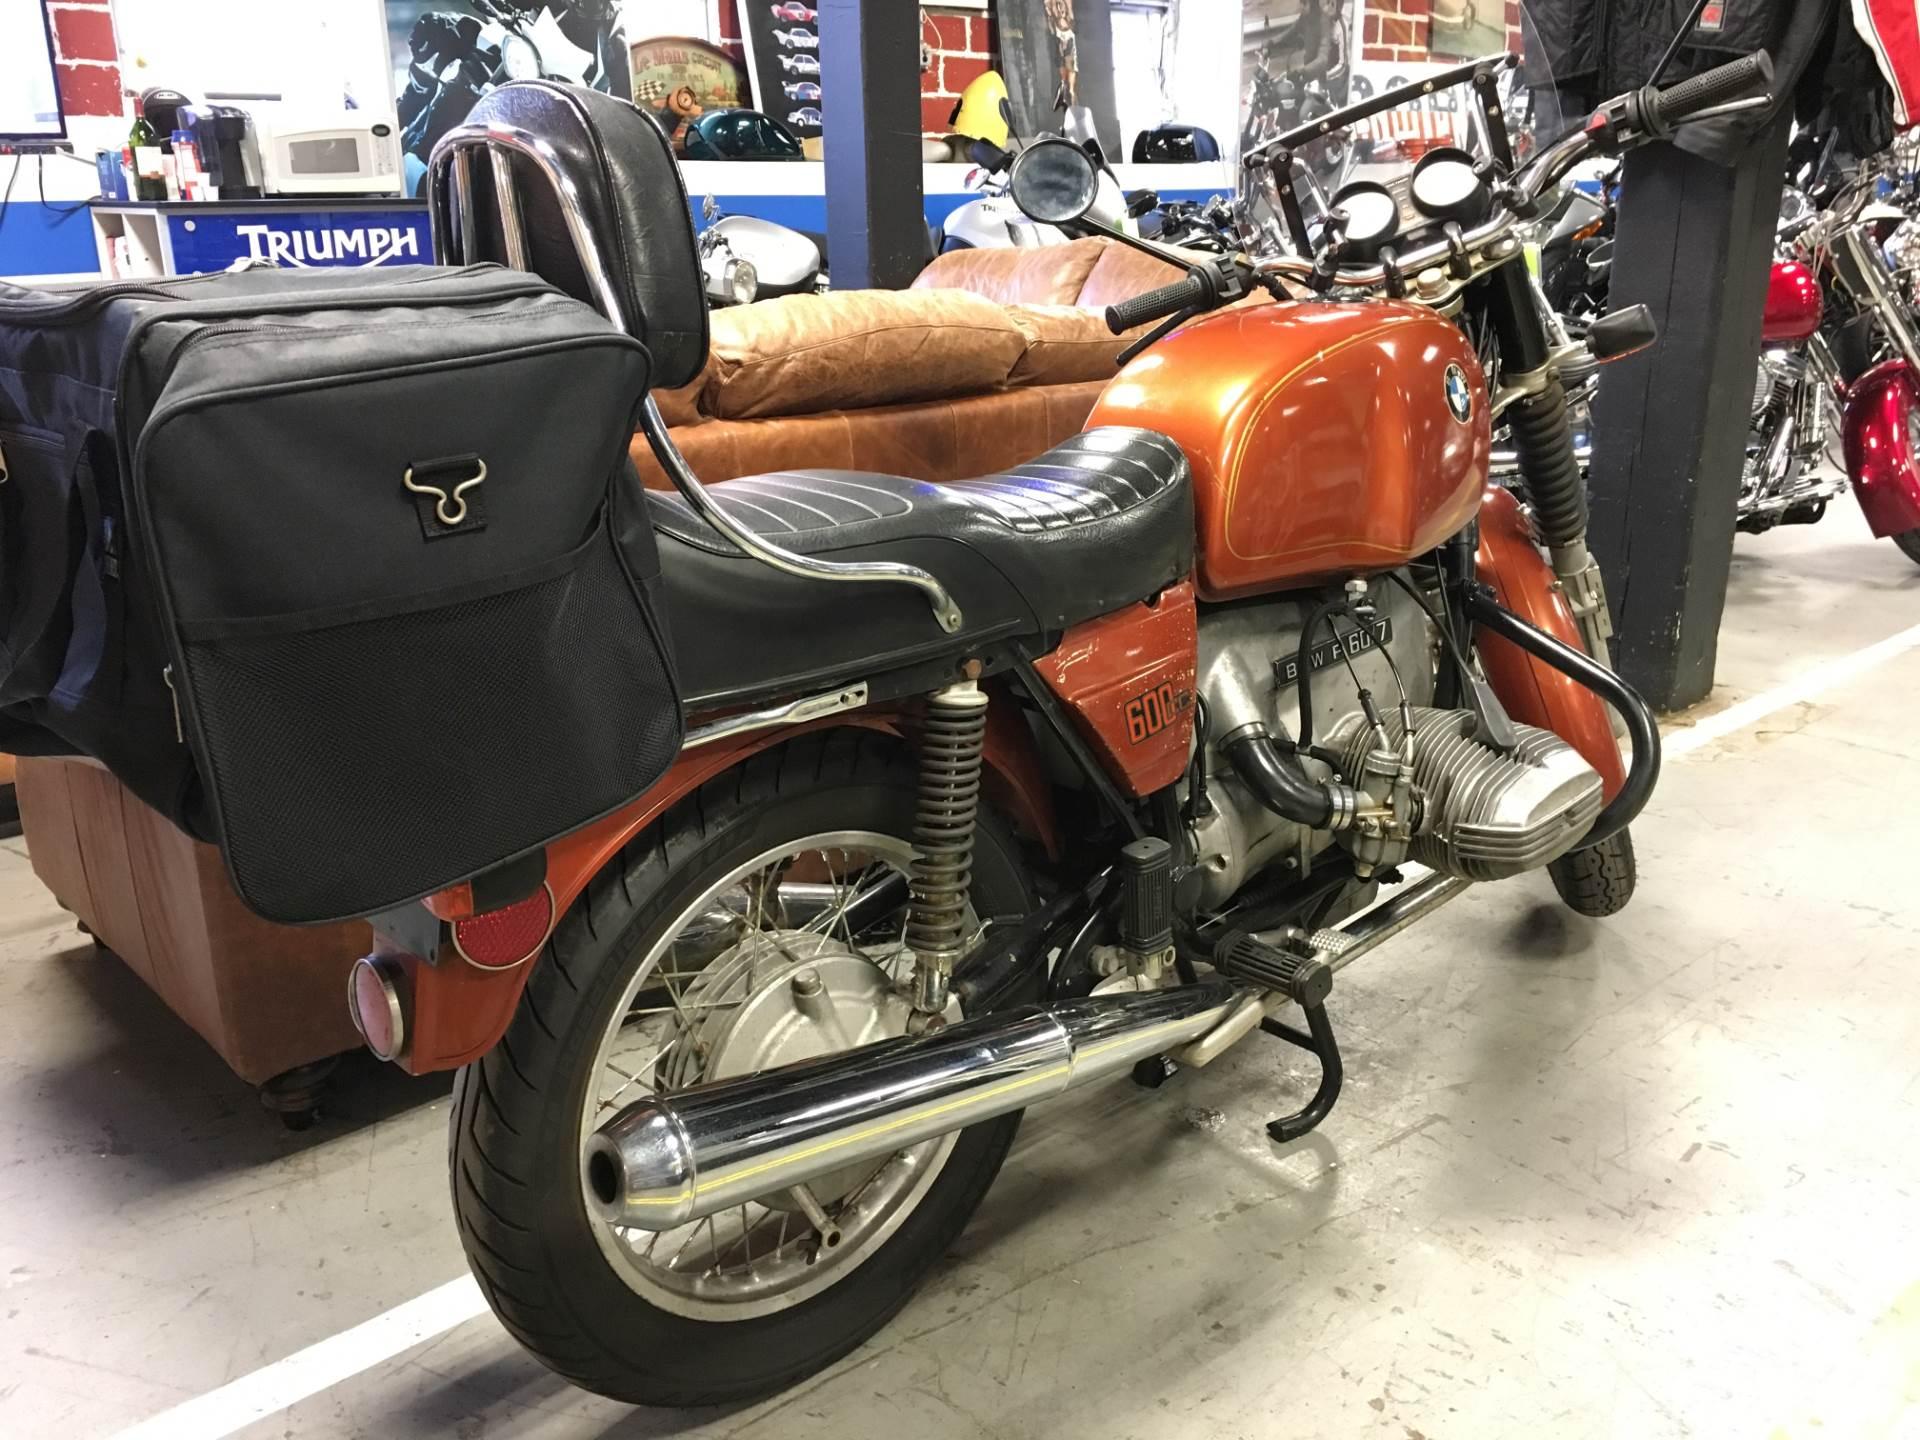 1977 BMW R60 7 Motorcycles Philadelphia Pennsylvania U